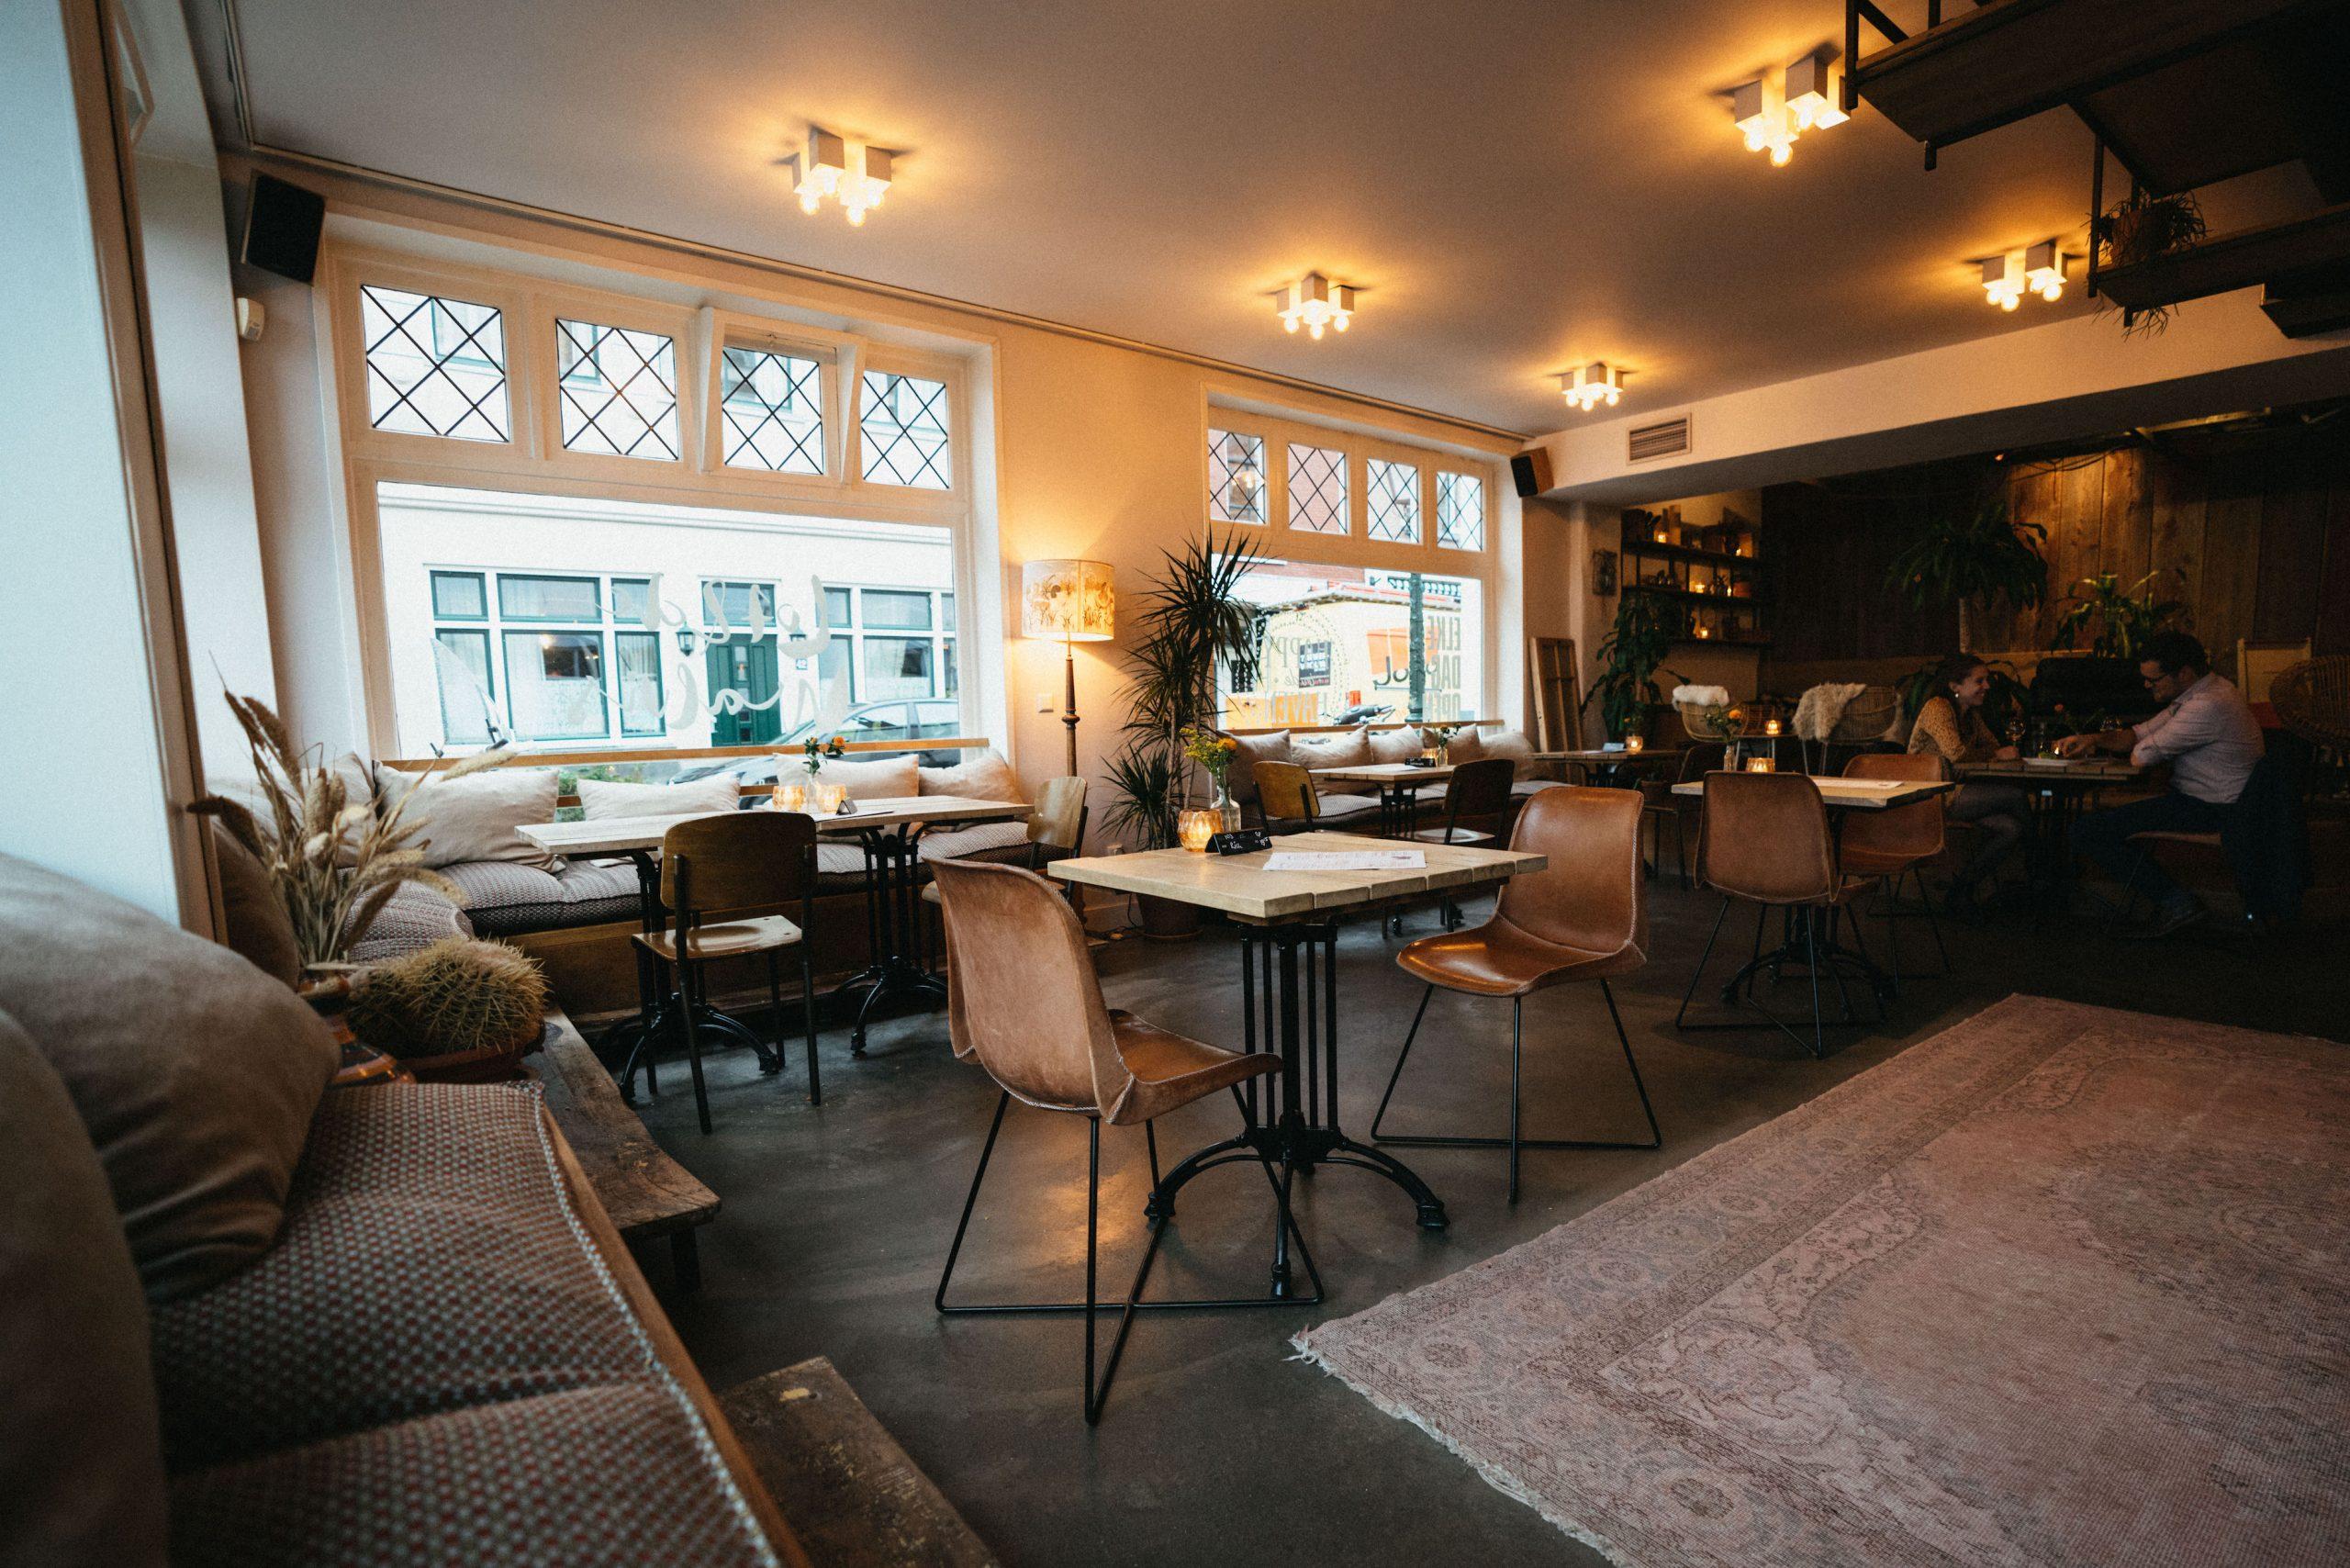 Bezienswaardigheden Leiden restaurant